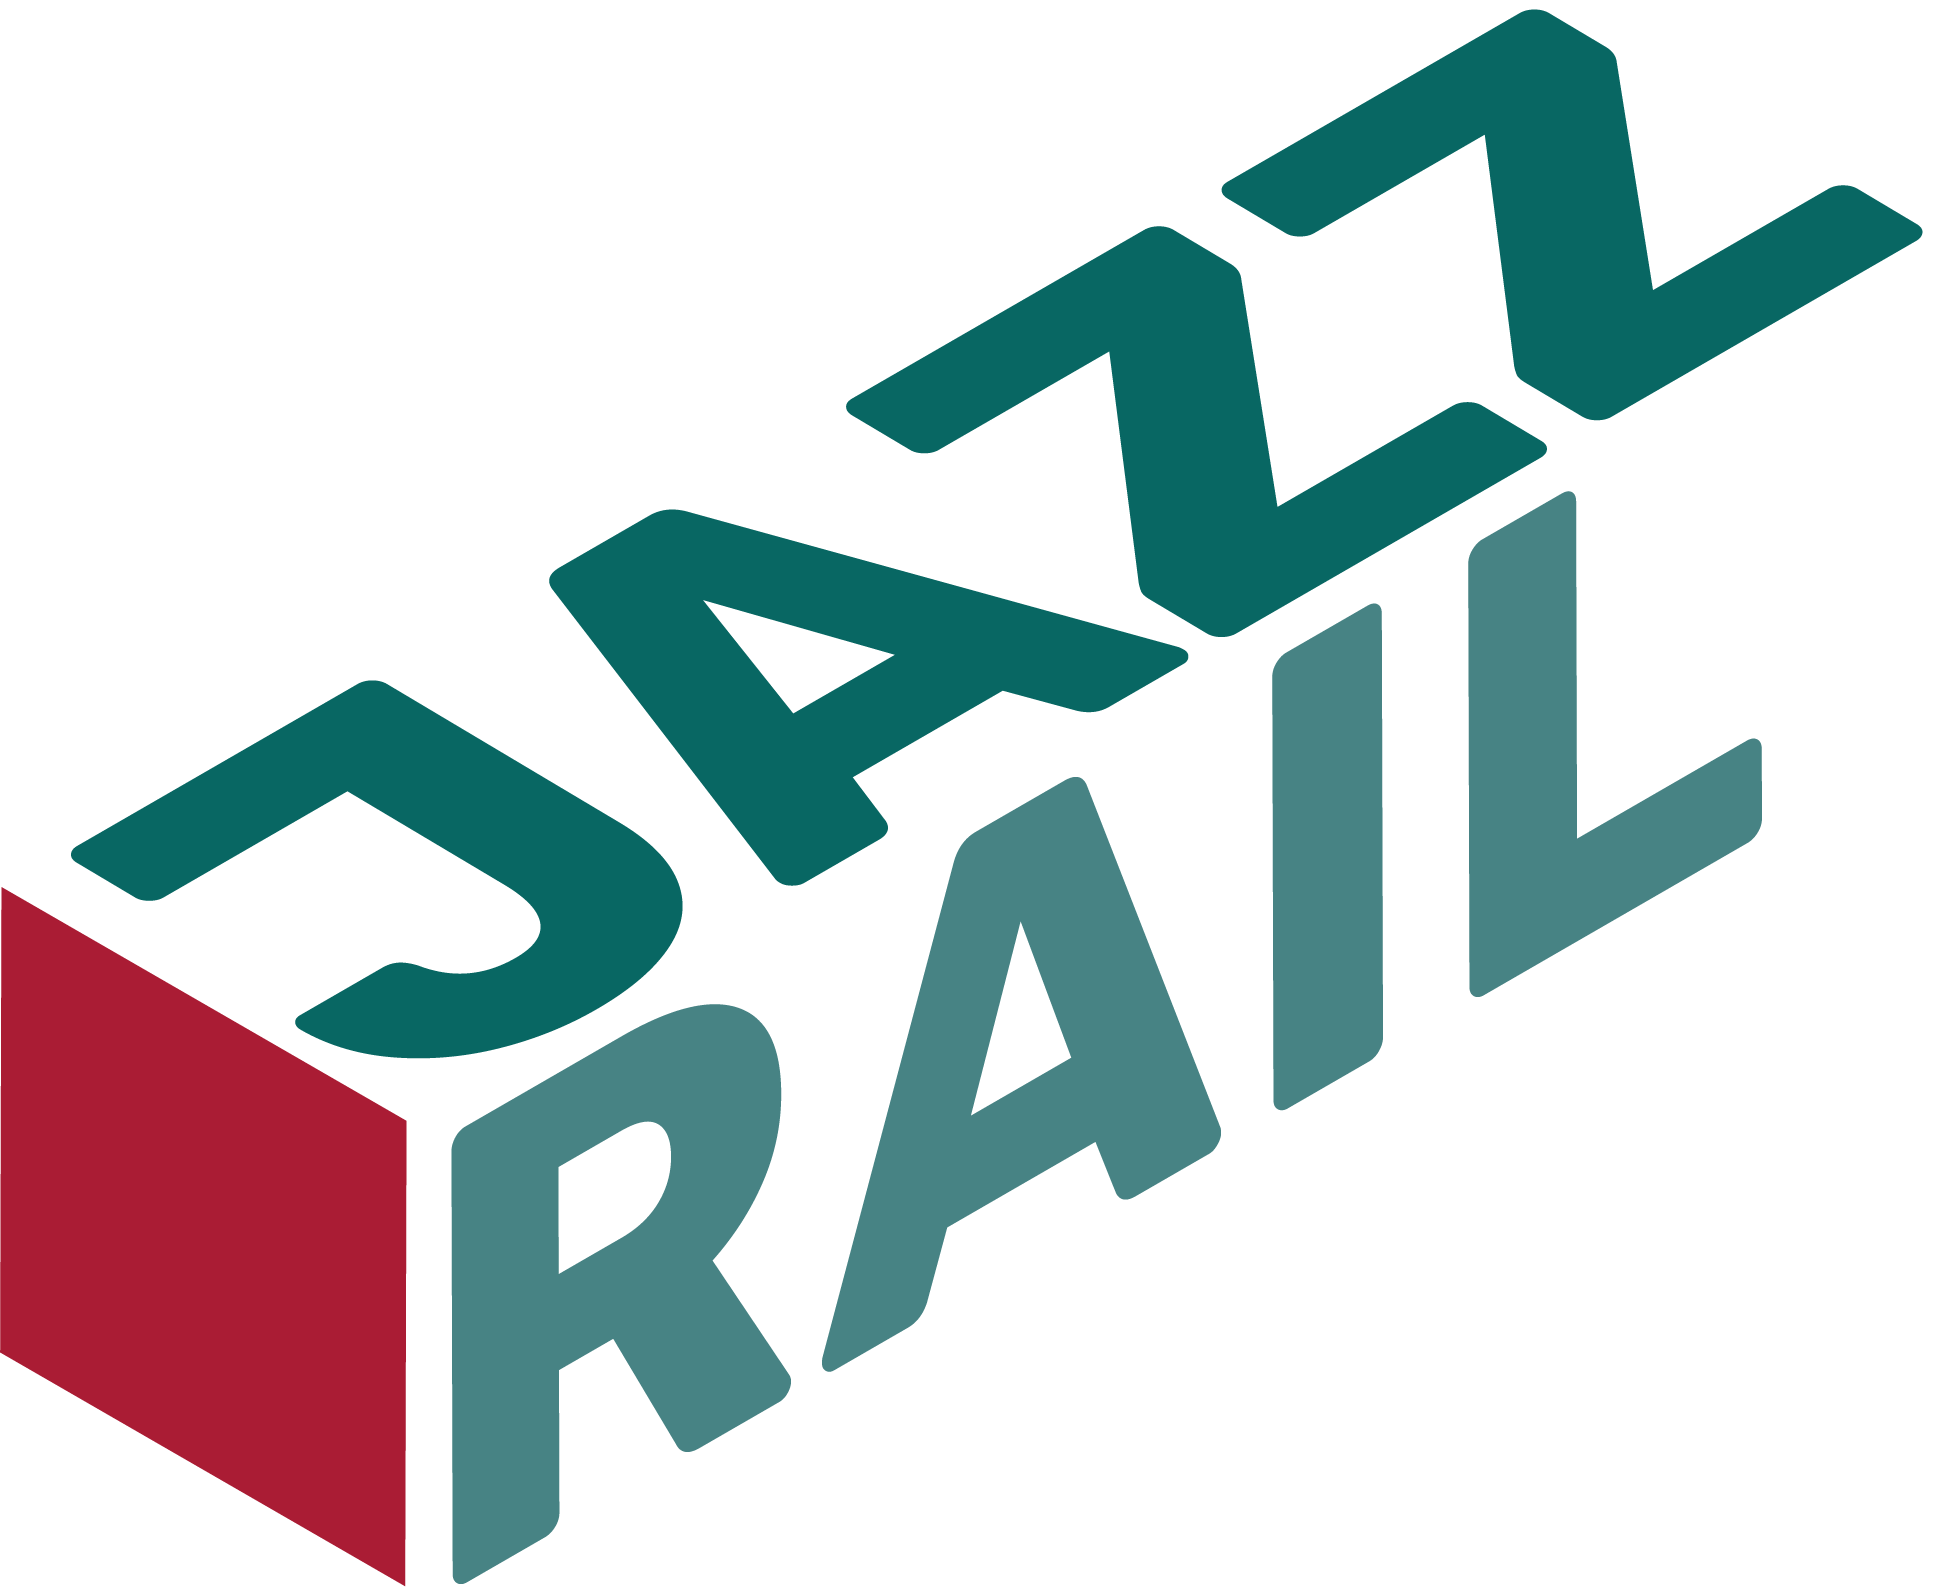 JazzRail